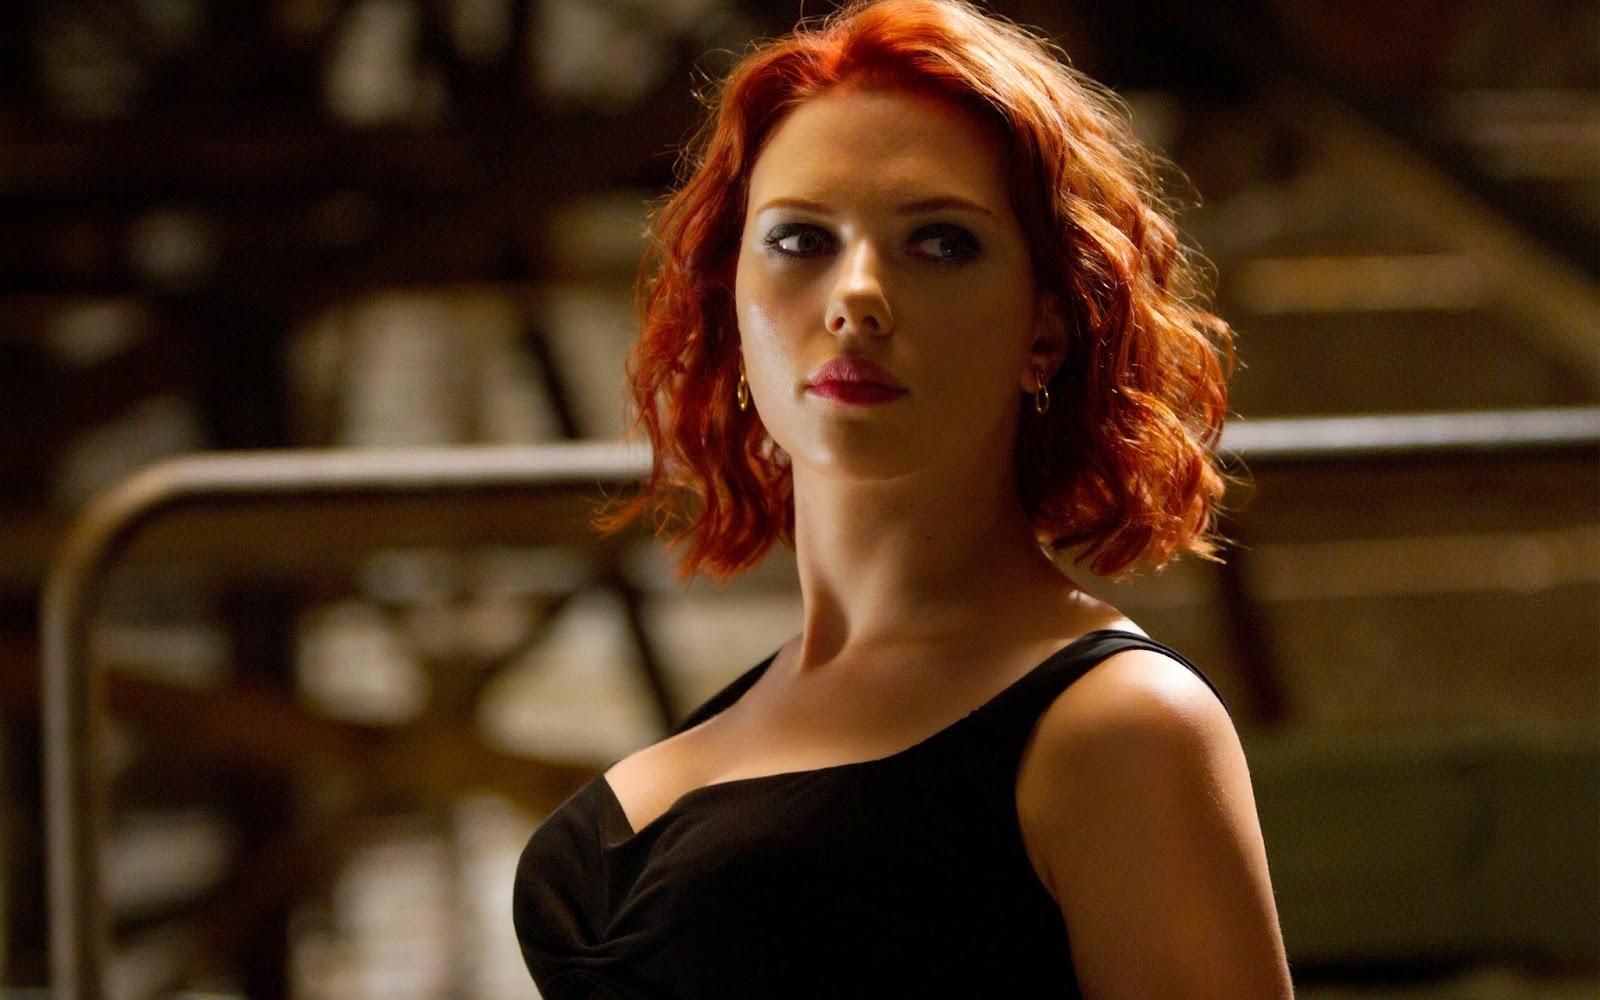 The avengers movie scarlett johansson actress wide Wallpaper